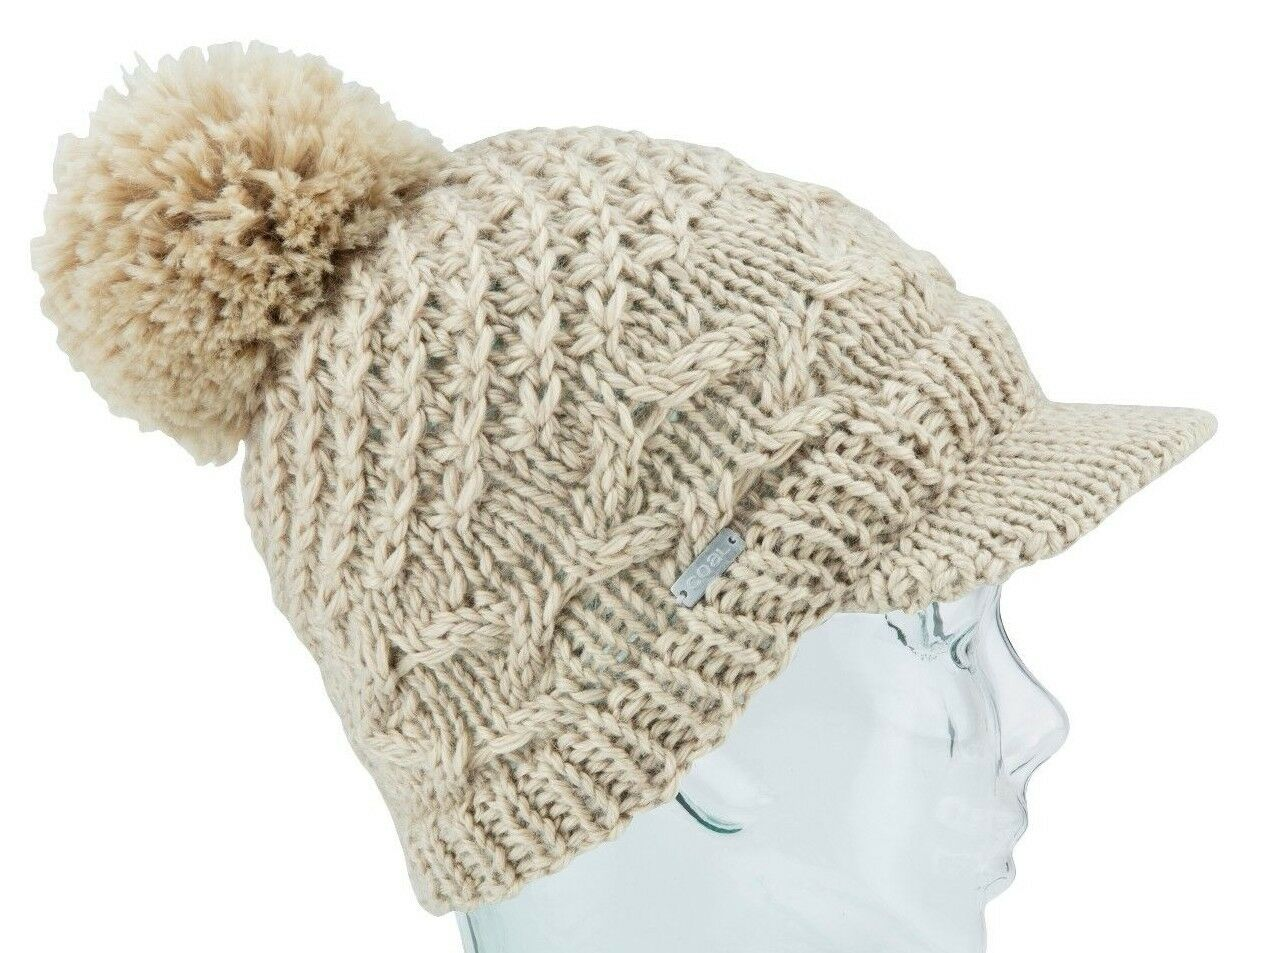 Coal Ras Headwear le Jane Ras Coal Bord Femmes Acrylique Mélange Pompon  Bonnet Kaki 6ef1b2 8e0b32f5f64